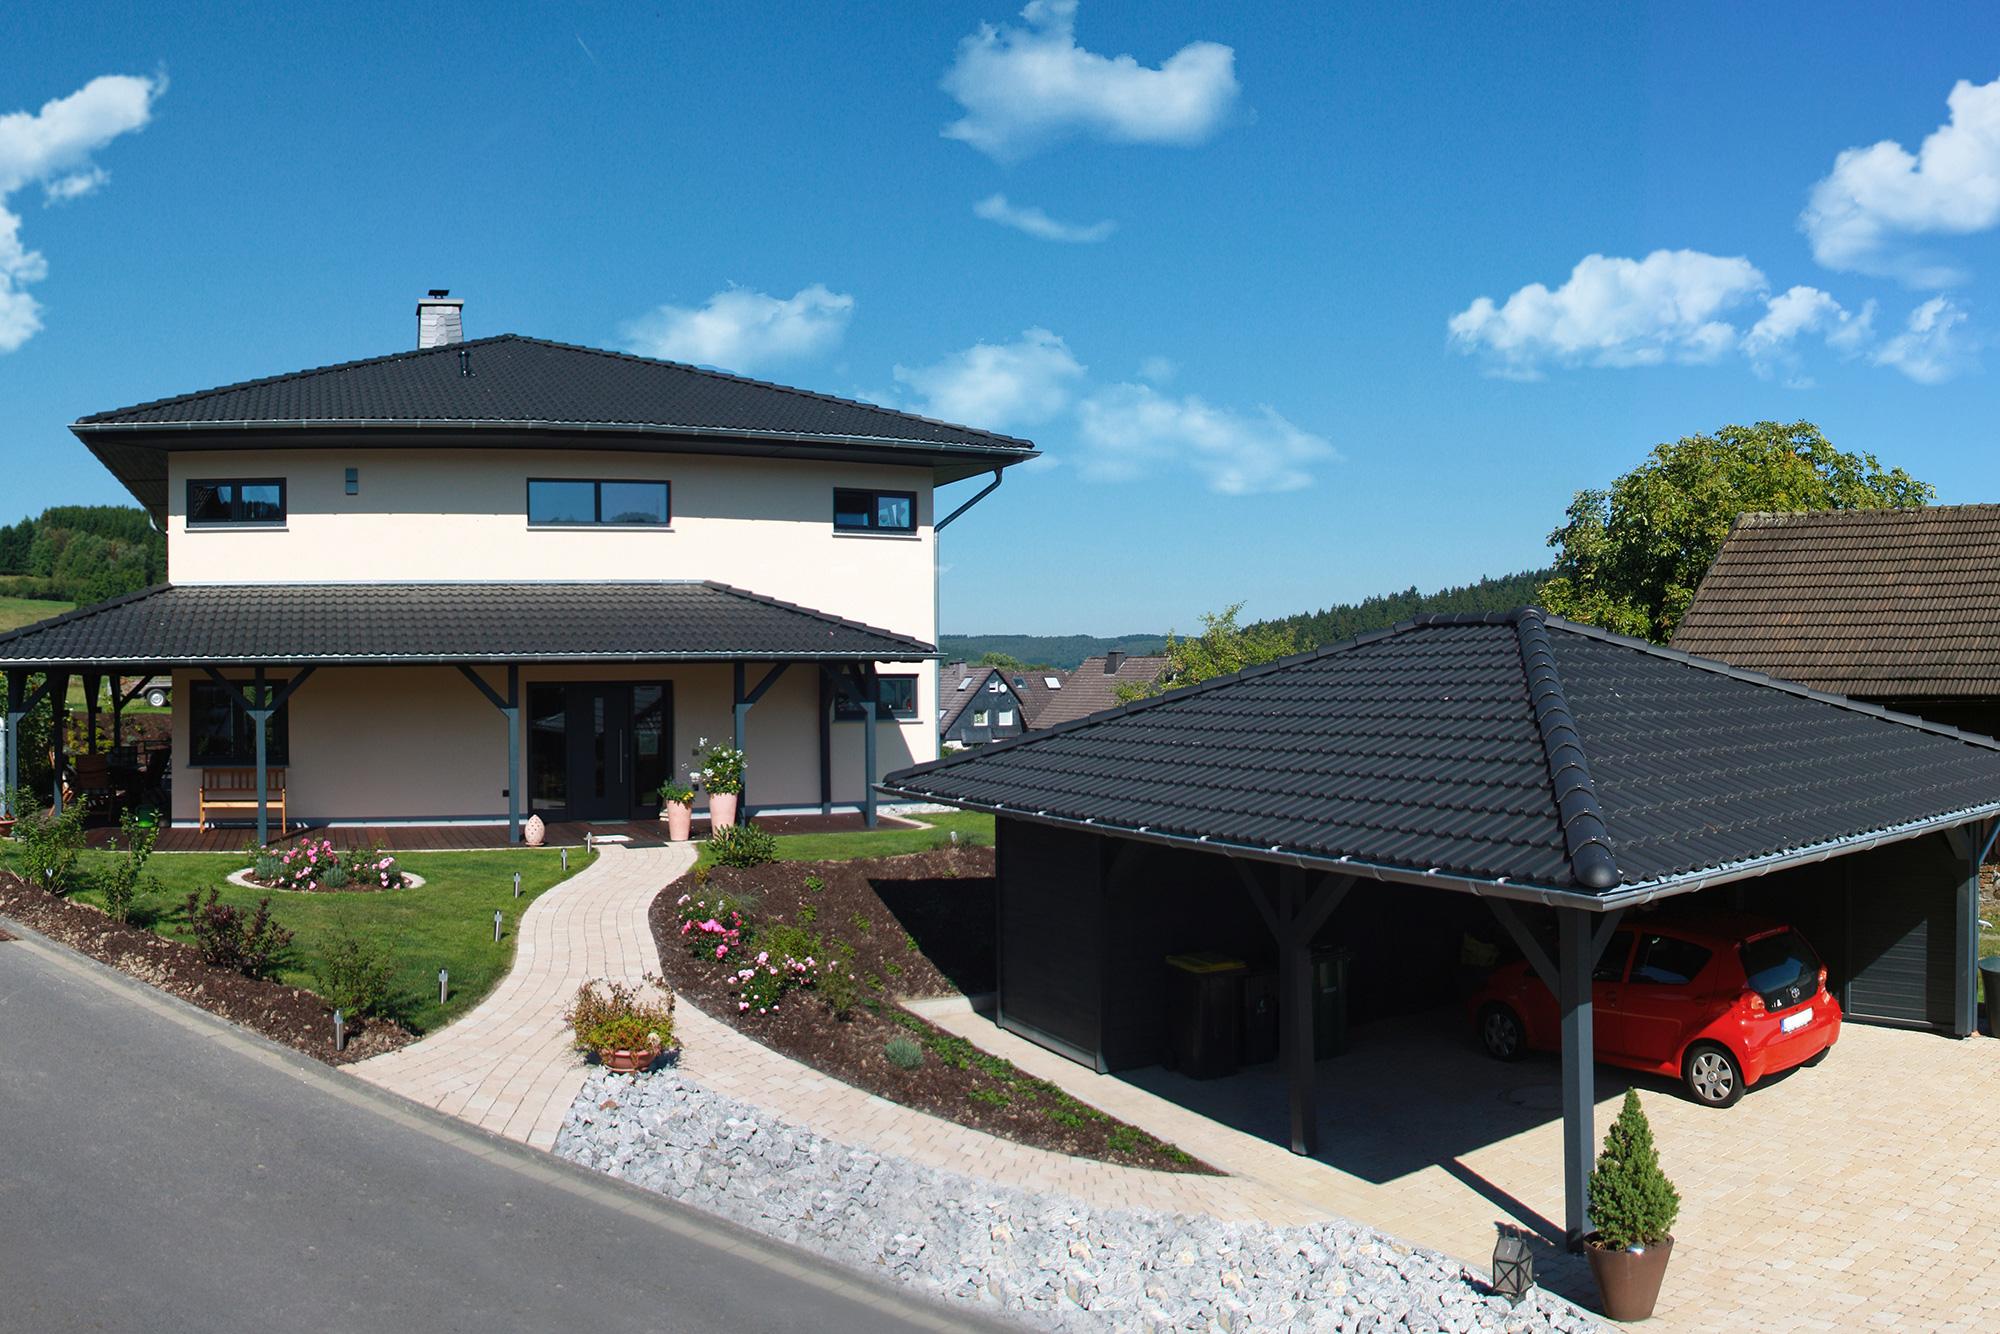 Moderne häuser zeltdach  Quasthaus GmbH – Zeltdachvilla